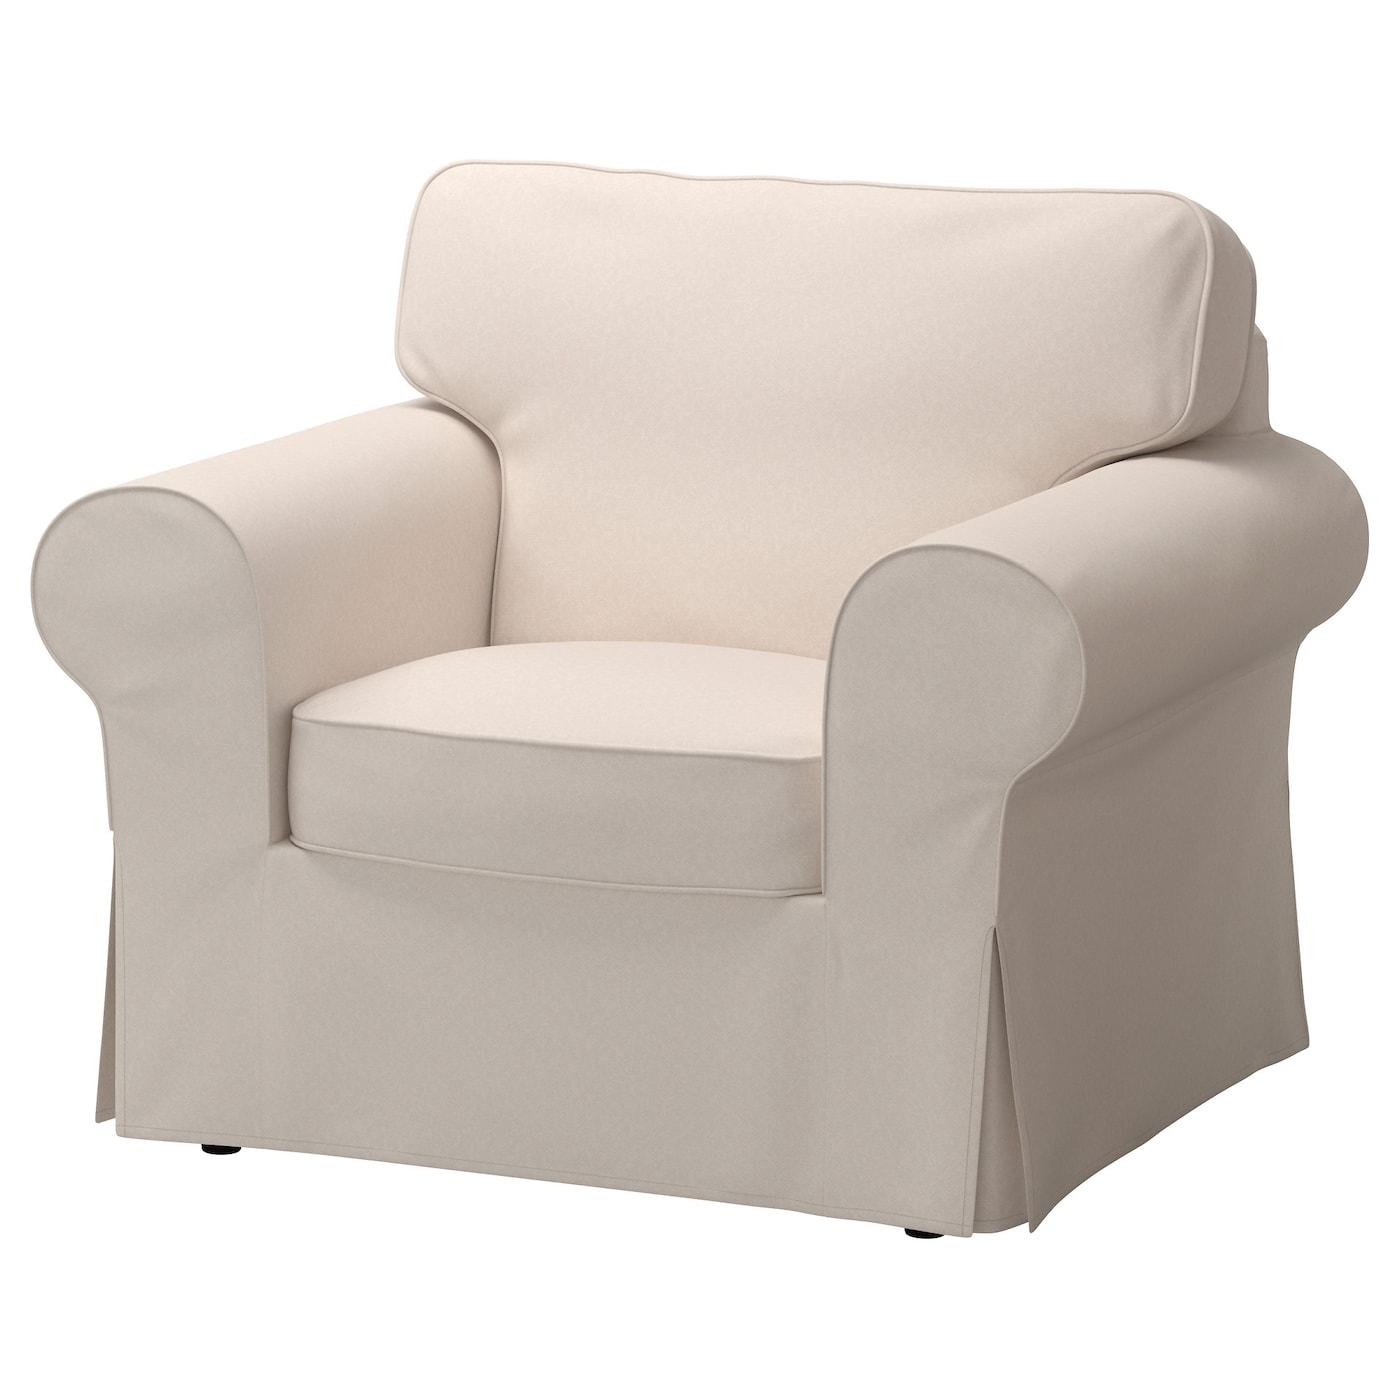 EKTORP Armchair Lofallet beige - IKEA